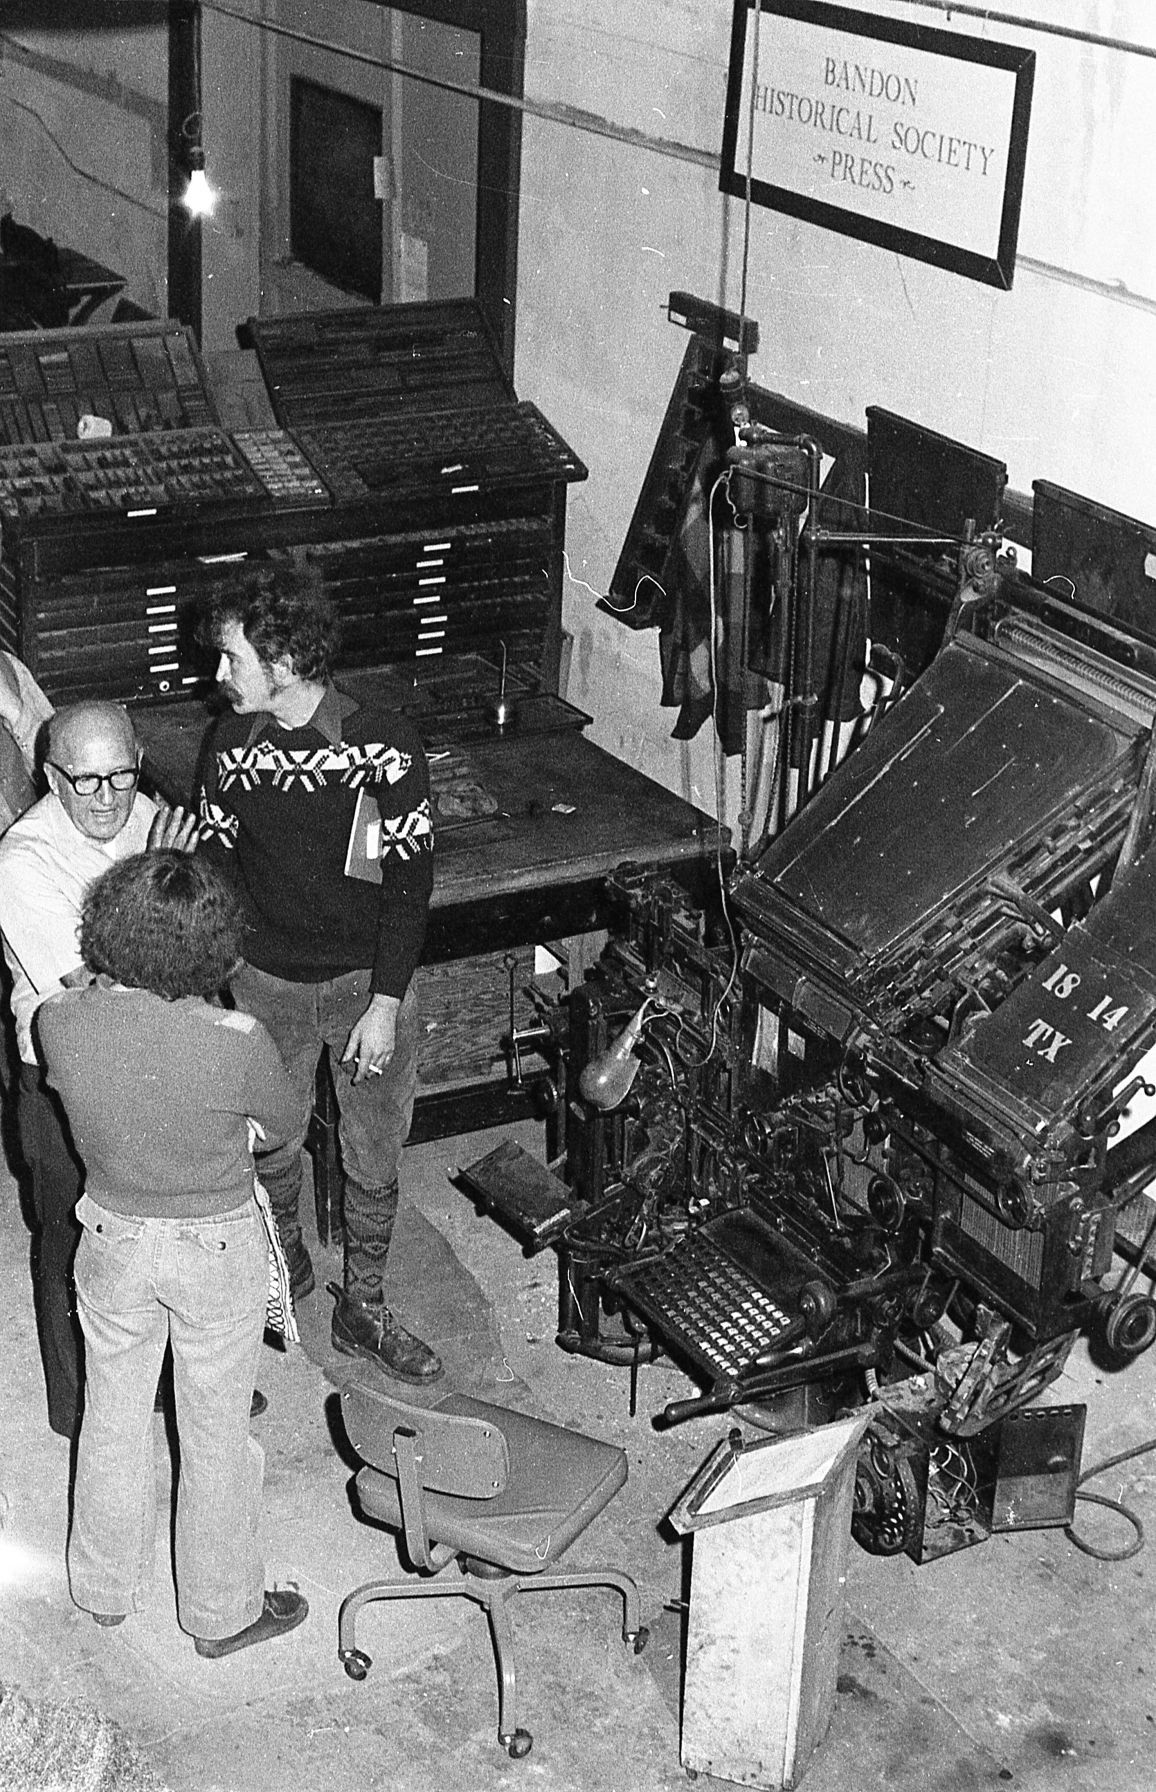 Museum display with linotype machine, 1978